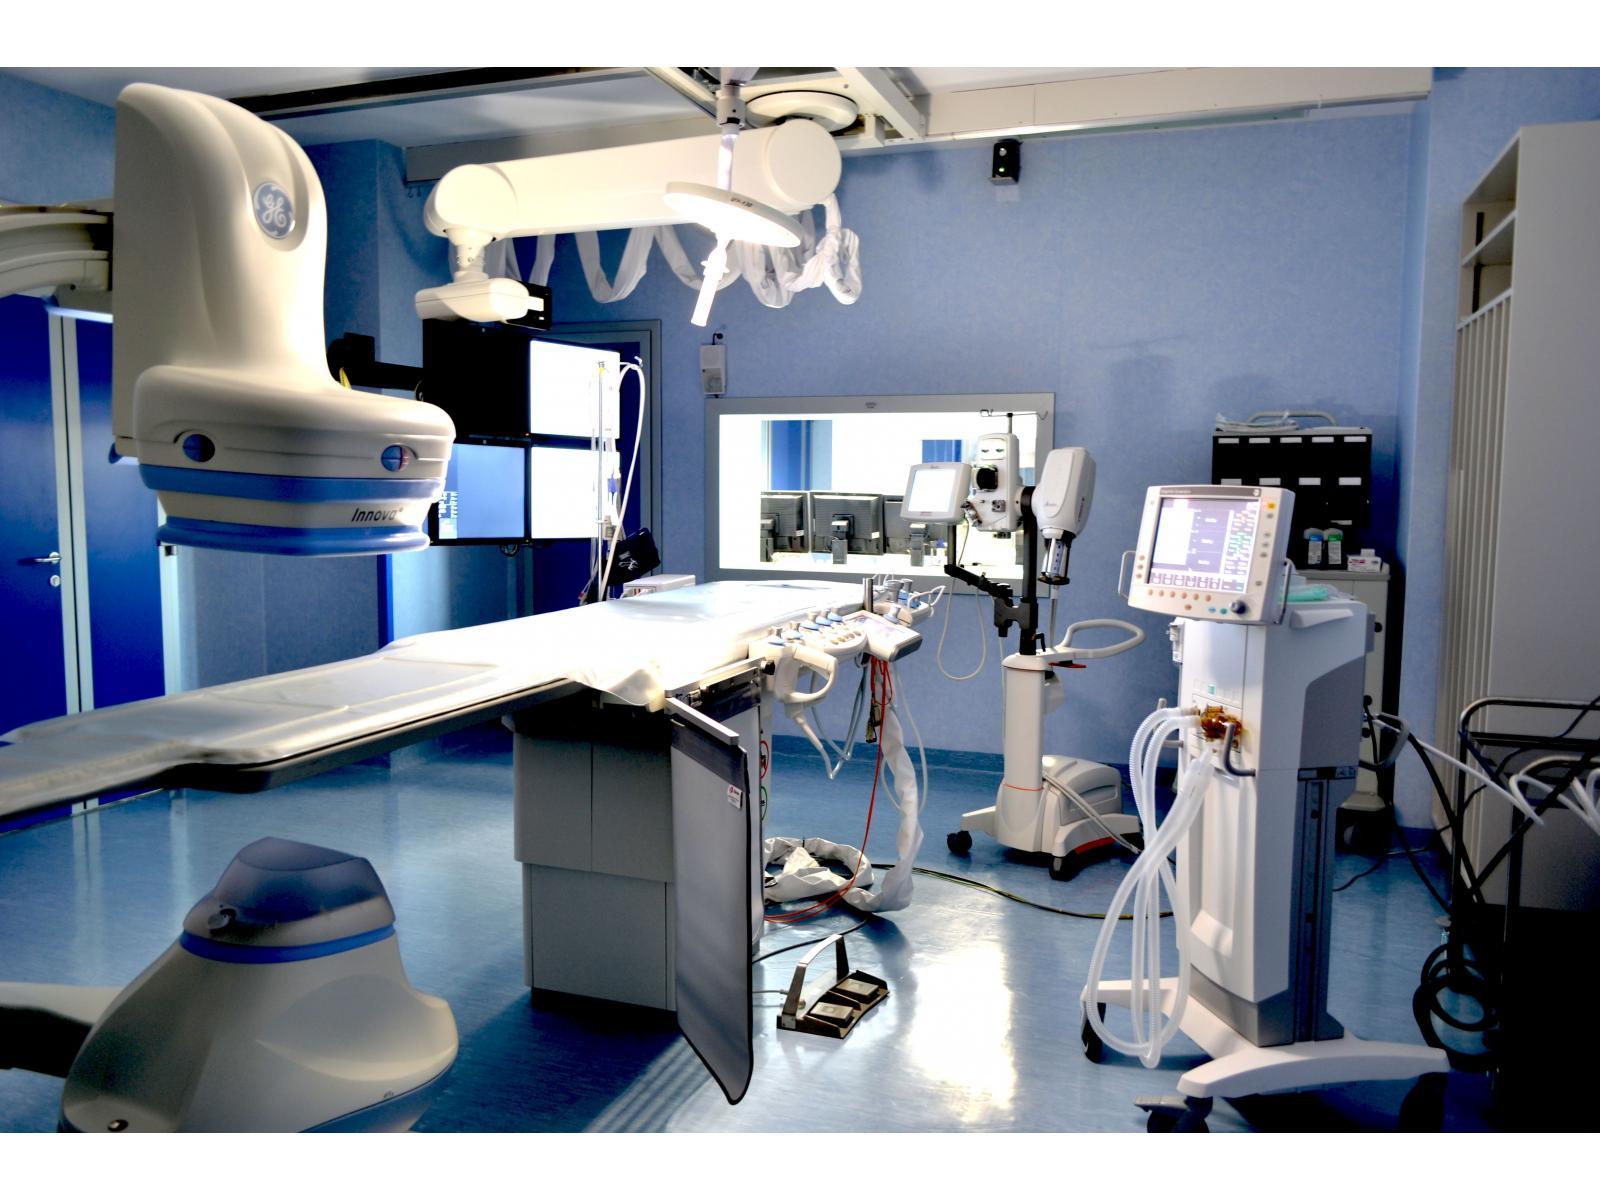 Spitalul Monza - Angiograf1.jpg